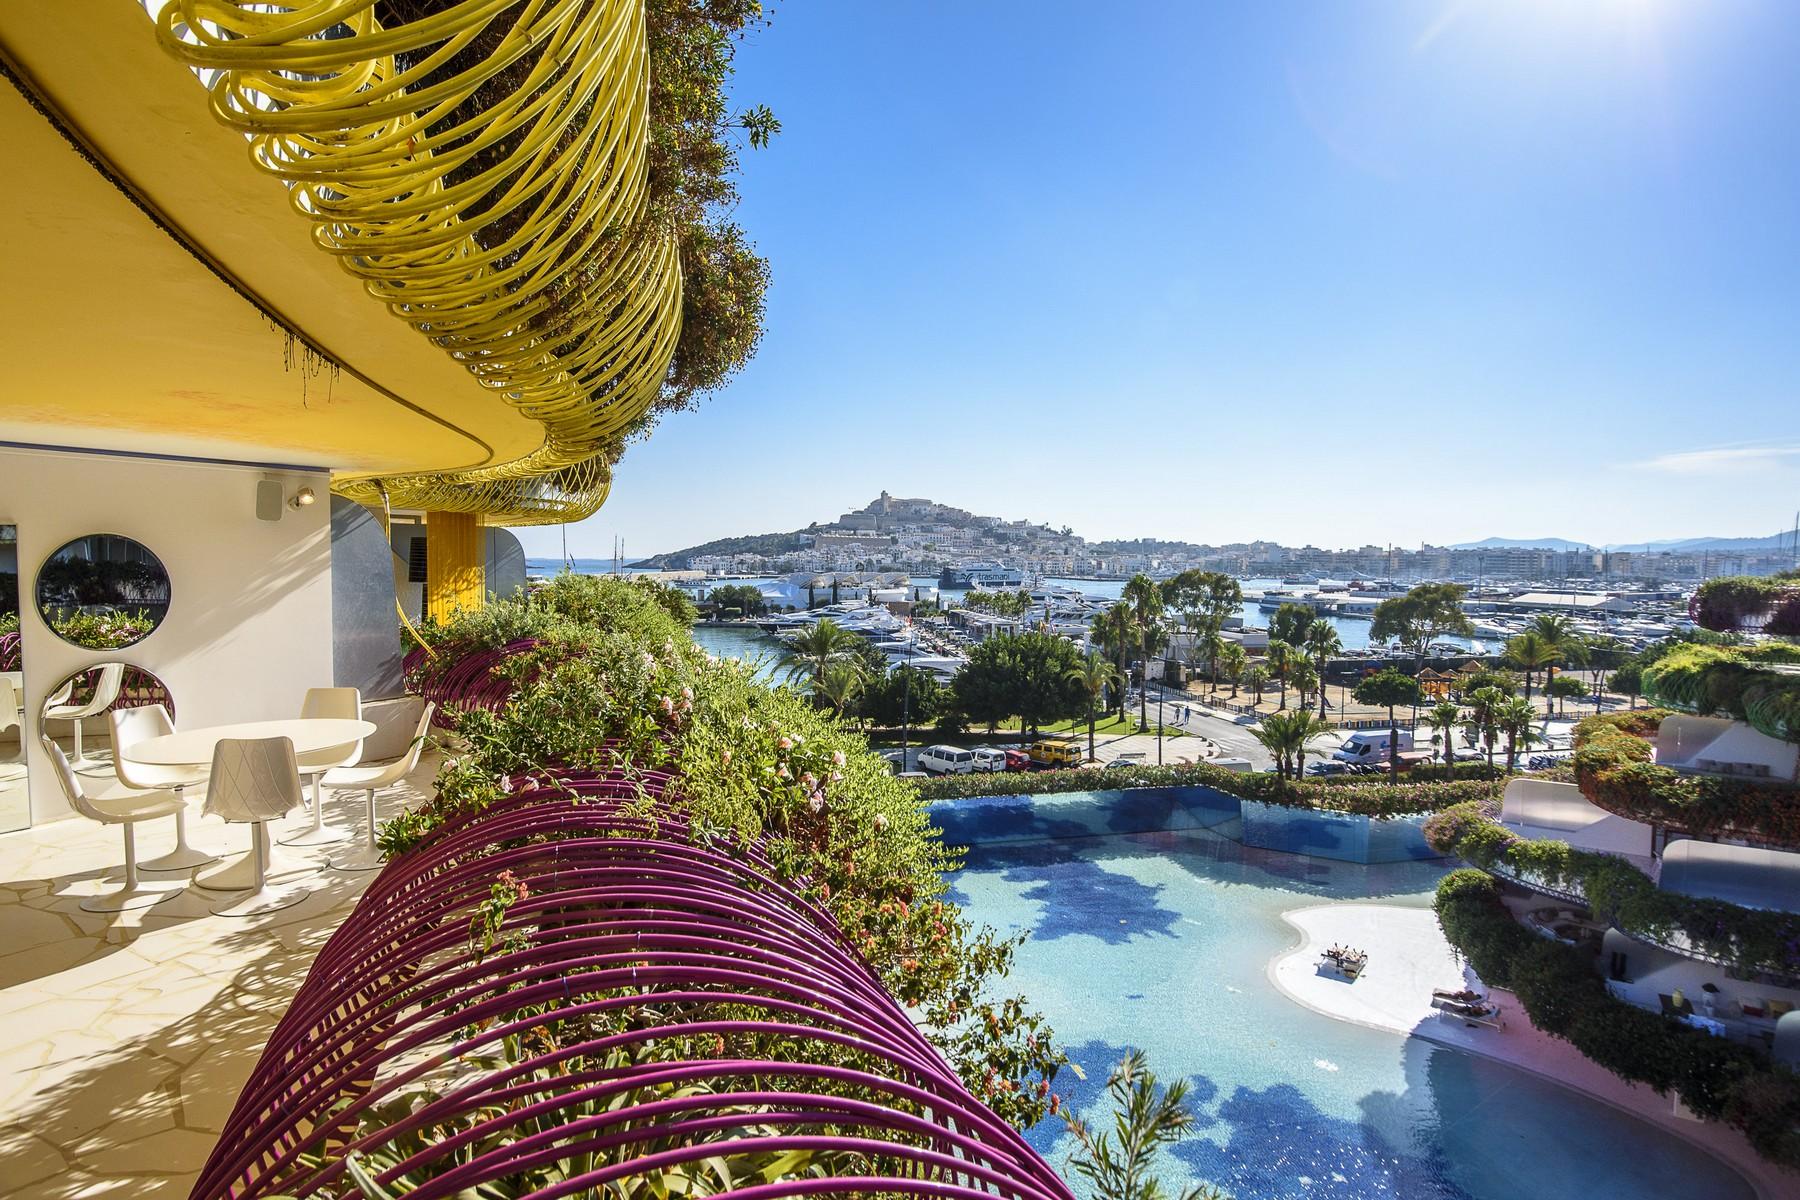 Квартира для того Продажа на Impressive 5Th Floor Apartment In Ibiza Marina Ibiza, Ивиса, 07800 Испания